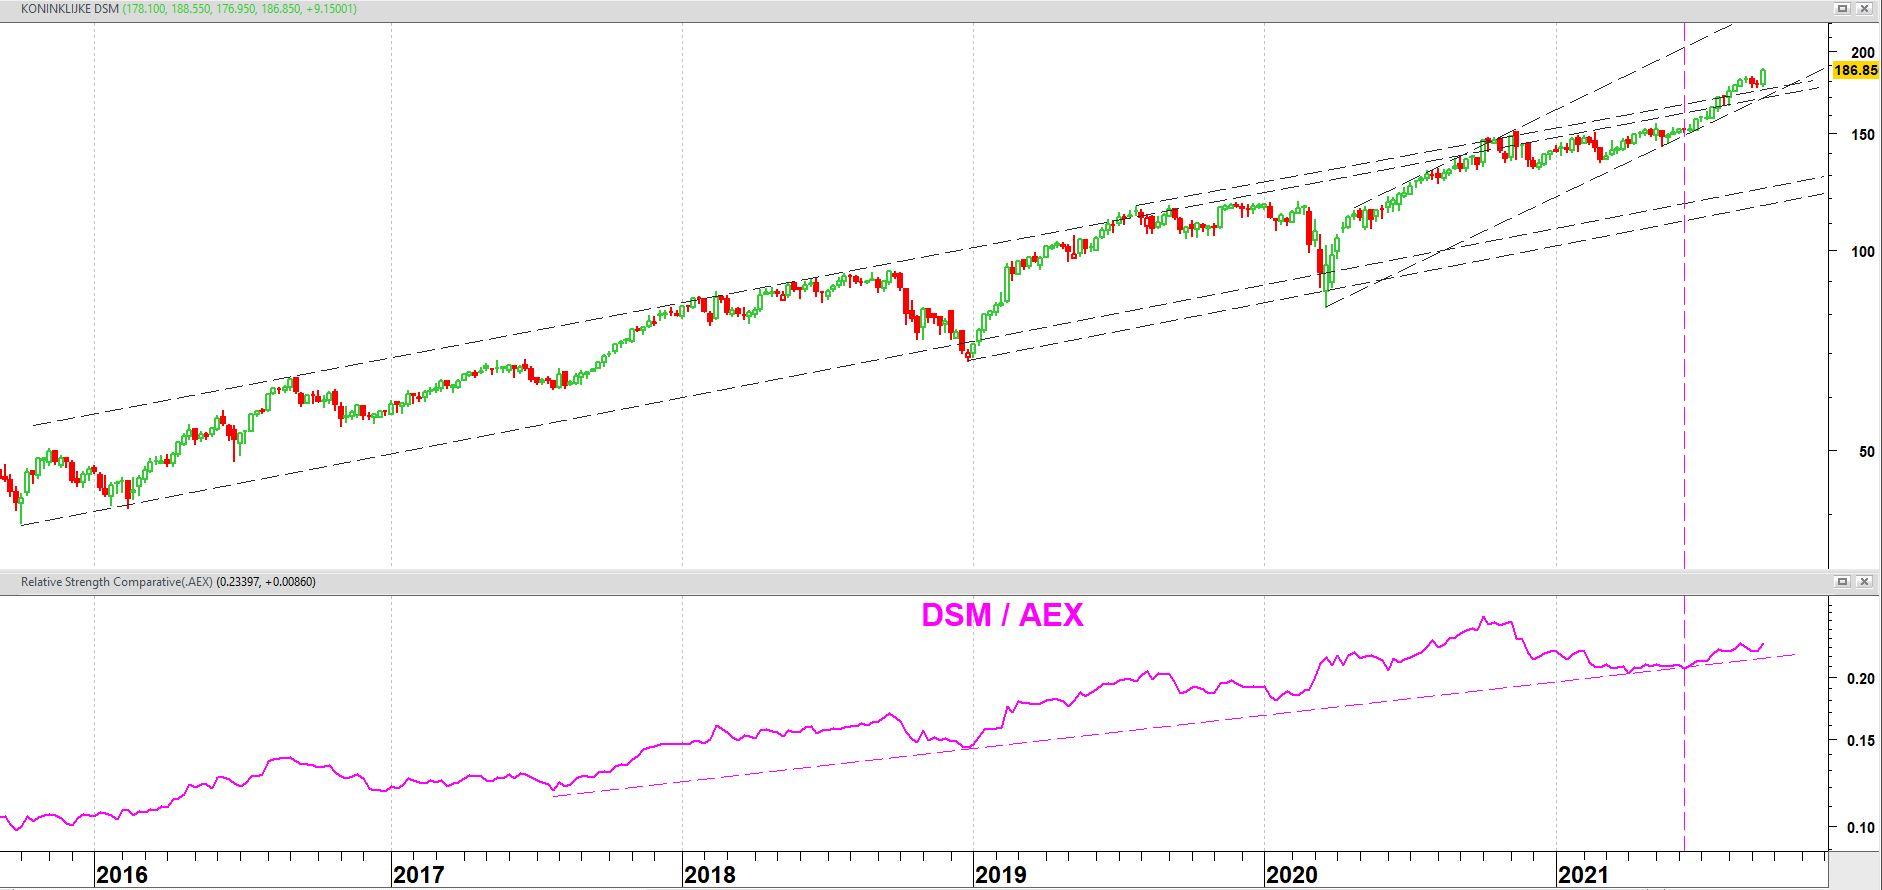 Koninklijke DSM op weekbasis vanaf september 2015 + relatieve sterkte t.o.v. AEX-index